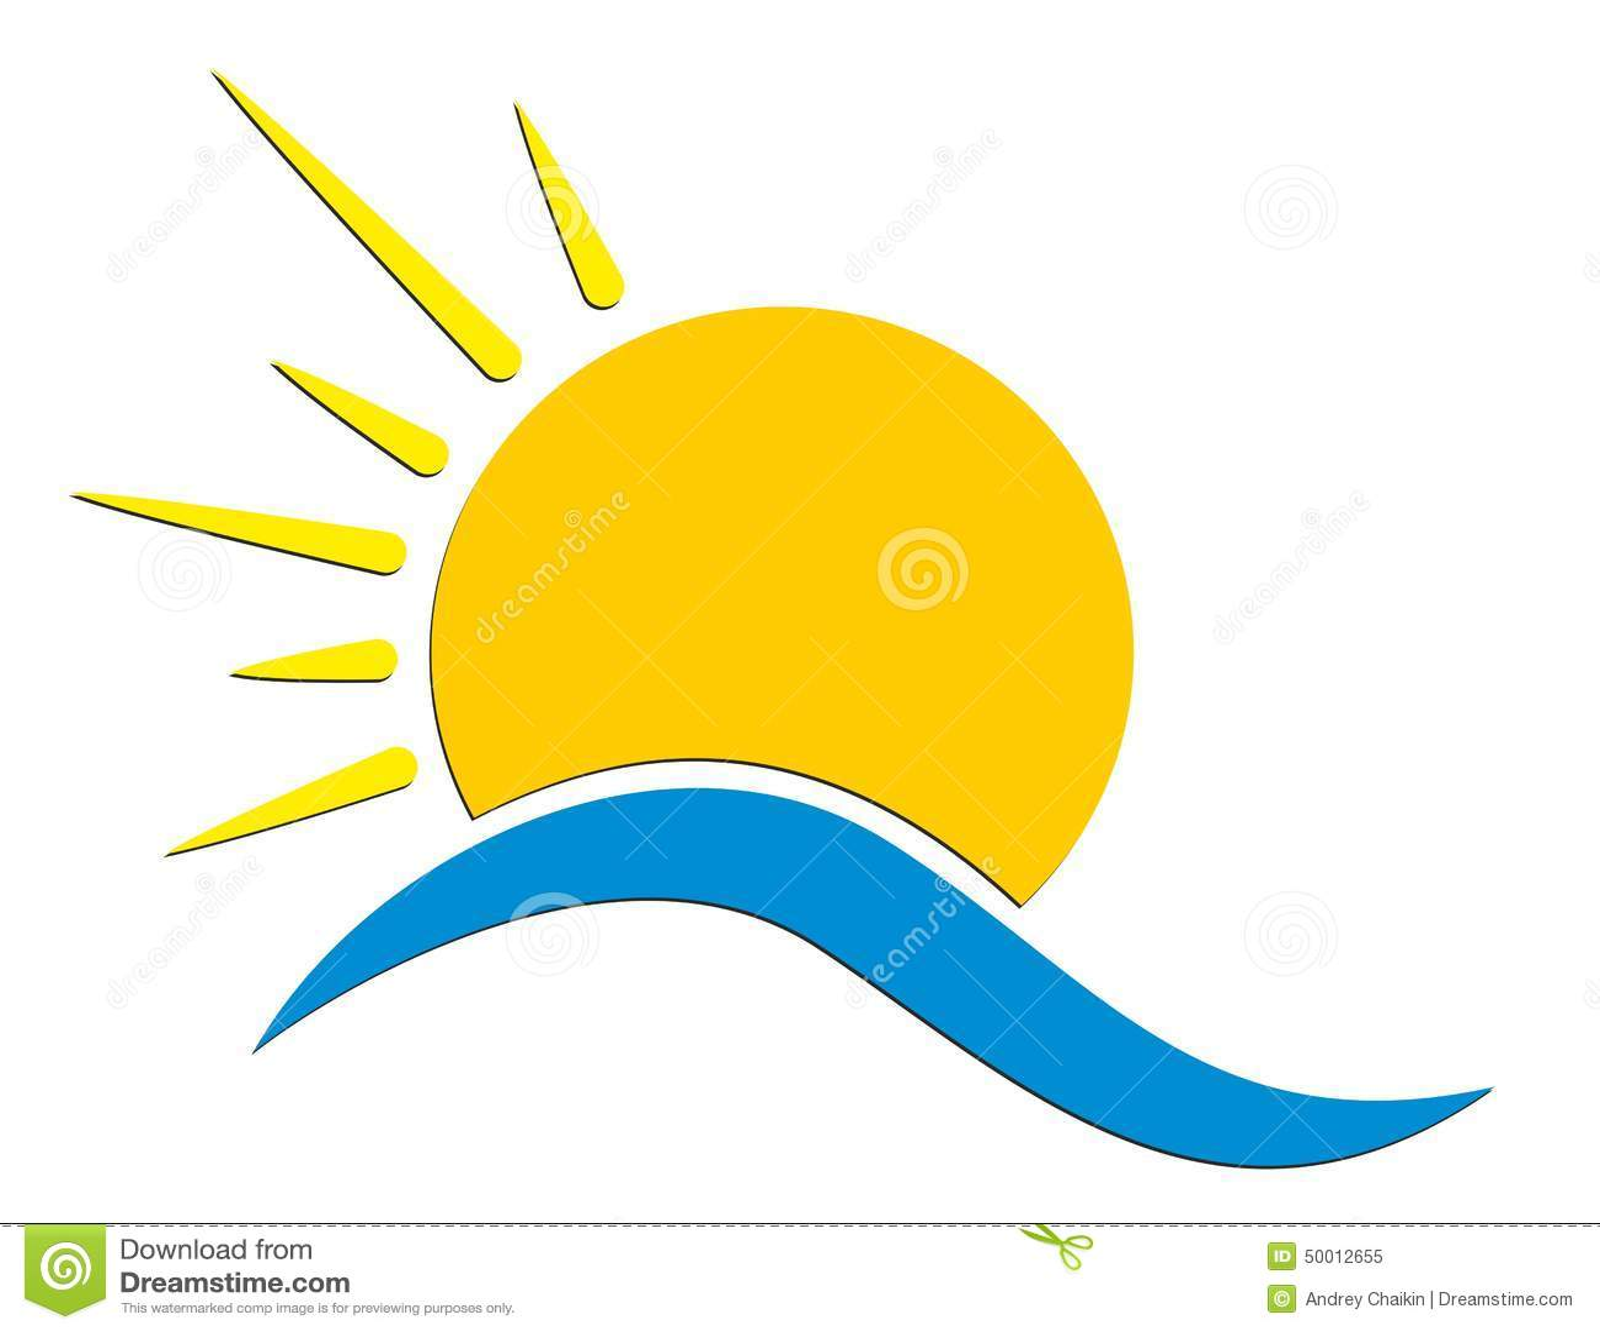 sun logo stock vector illustration of blue sunlight